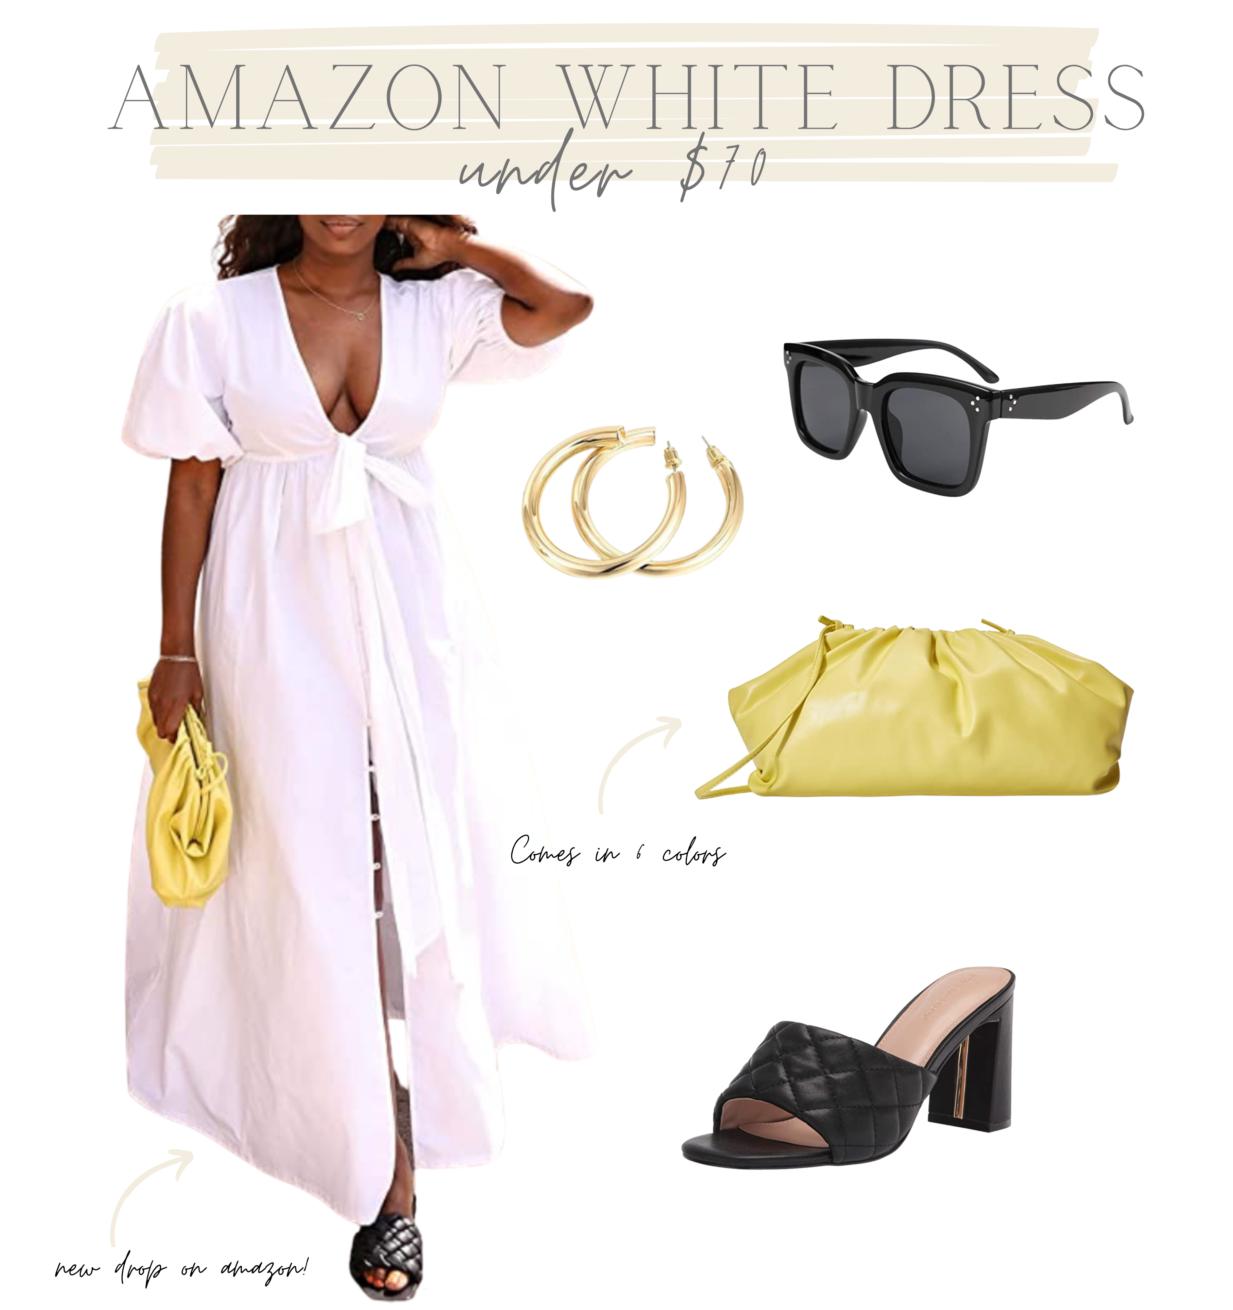 yellow clutch, amazon clutch, best-selling clutch, white dress, summer white dress, black sunnies, black heels, amazon white dress